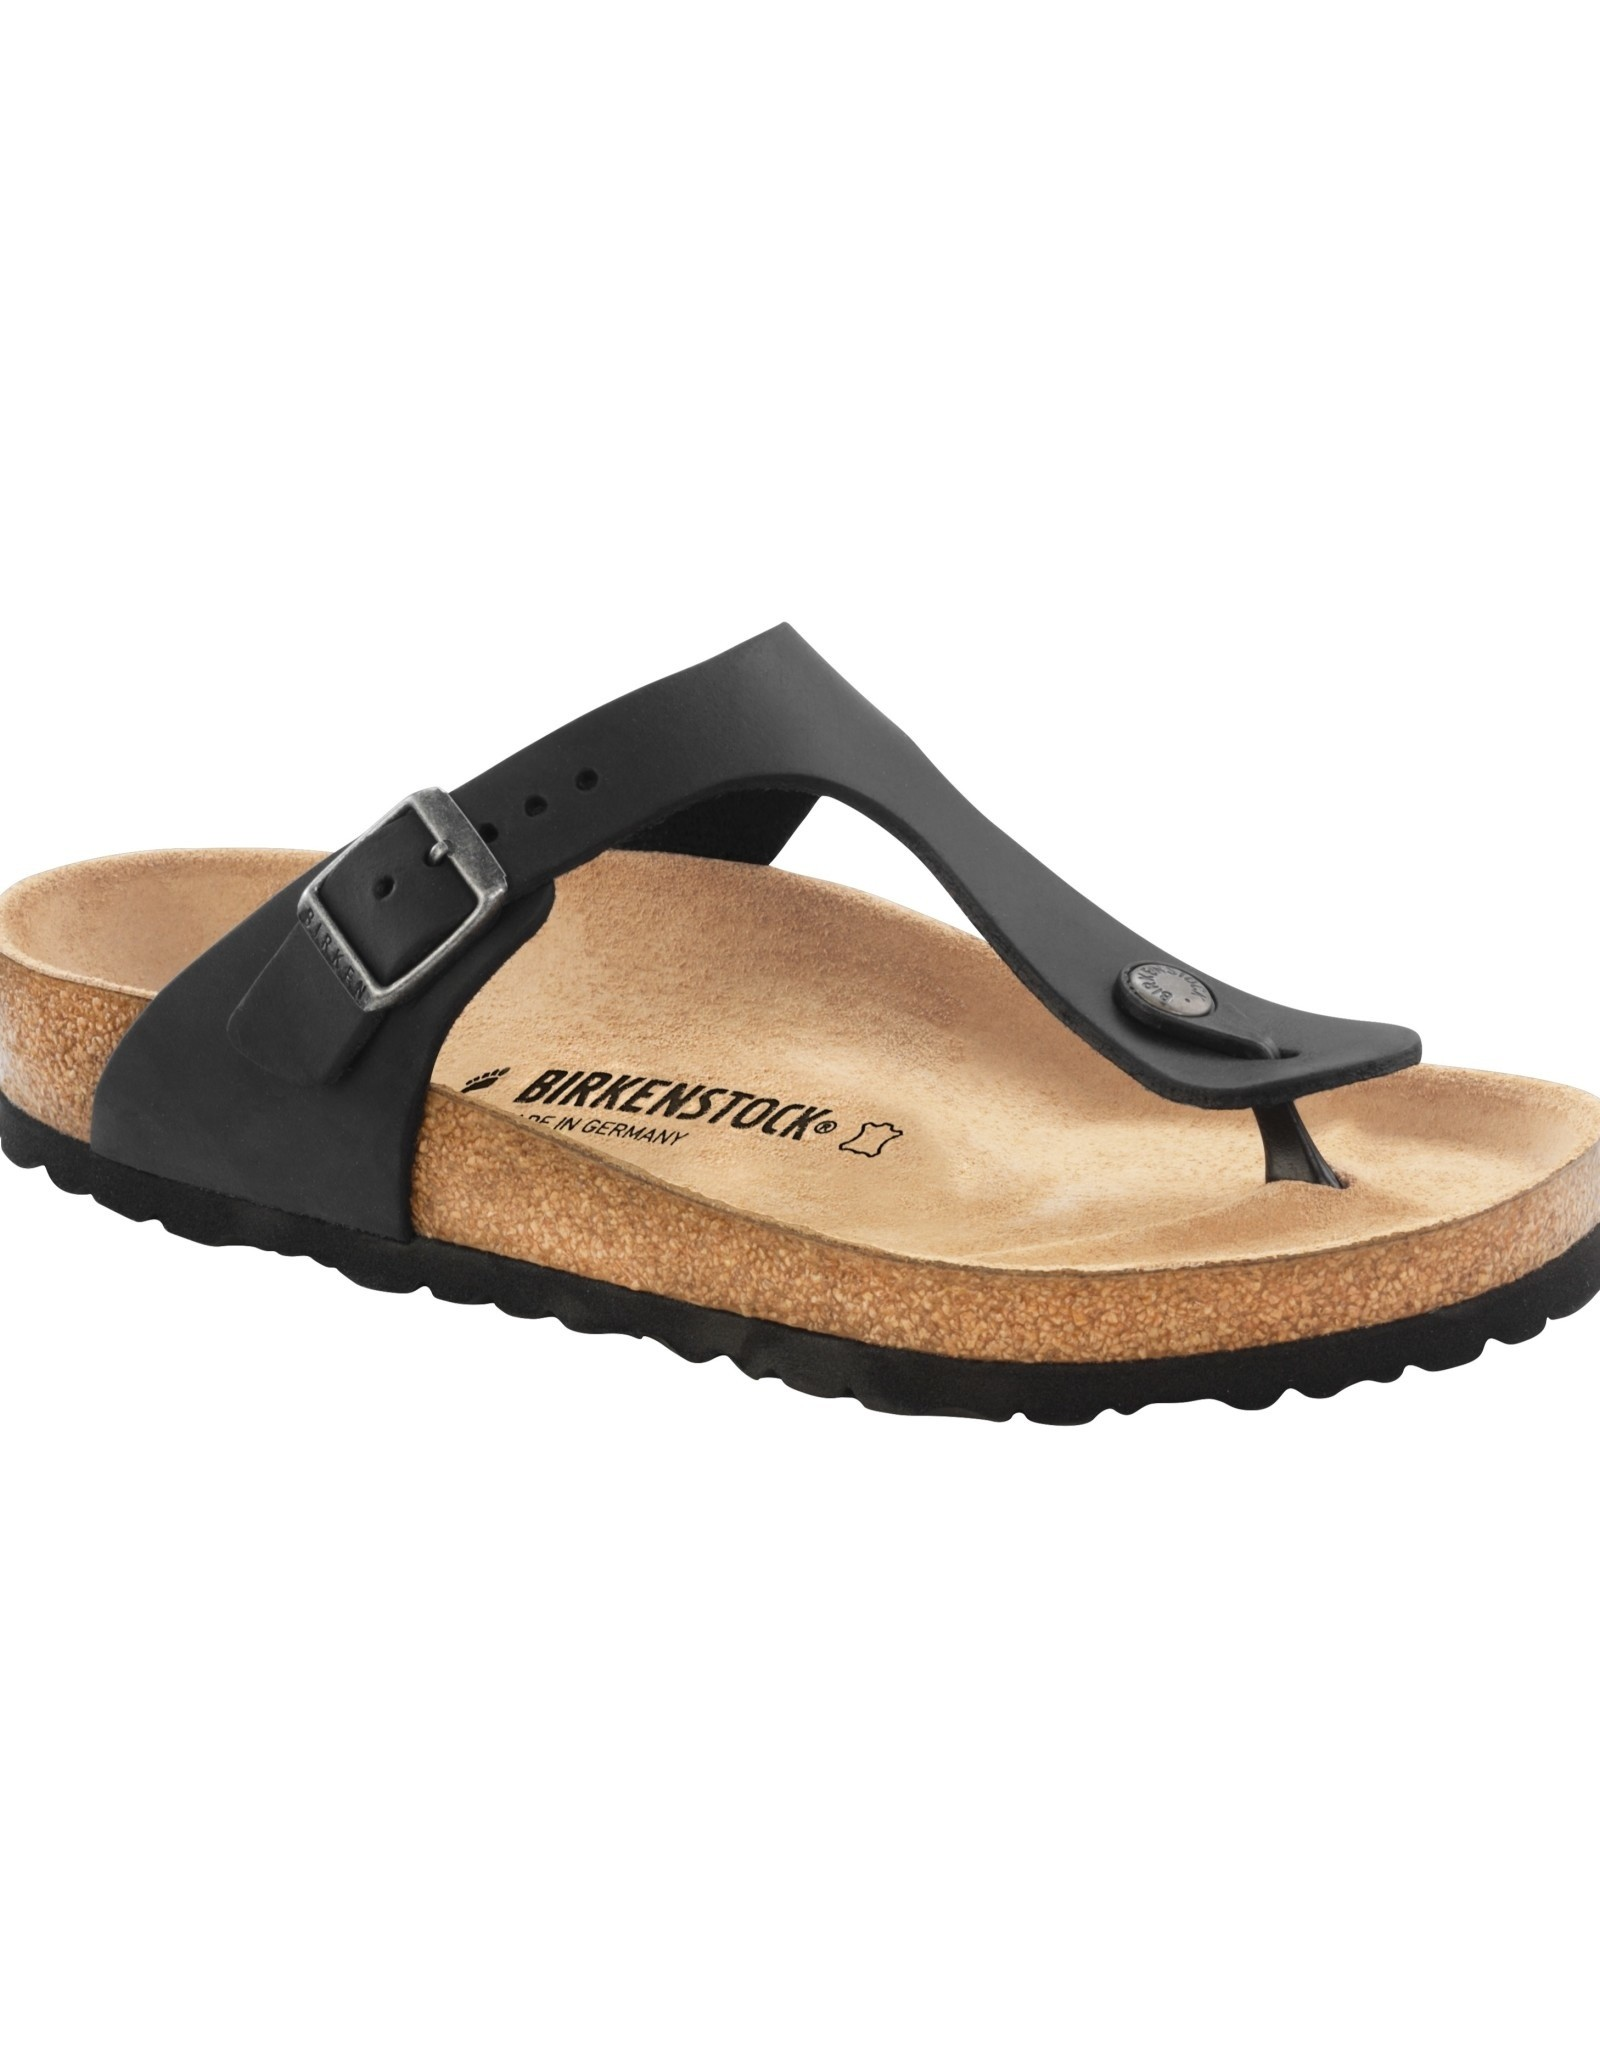 Birkenstock Available In Store ONLY - Birkenstock Gizeh Ladies'